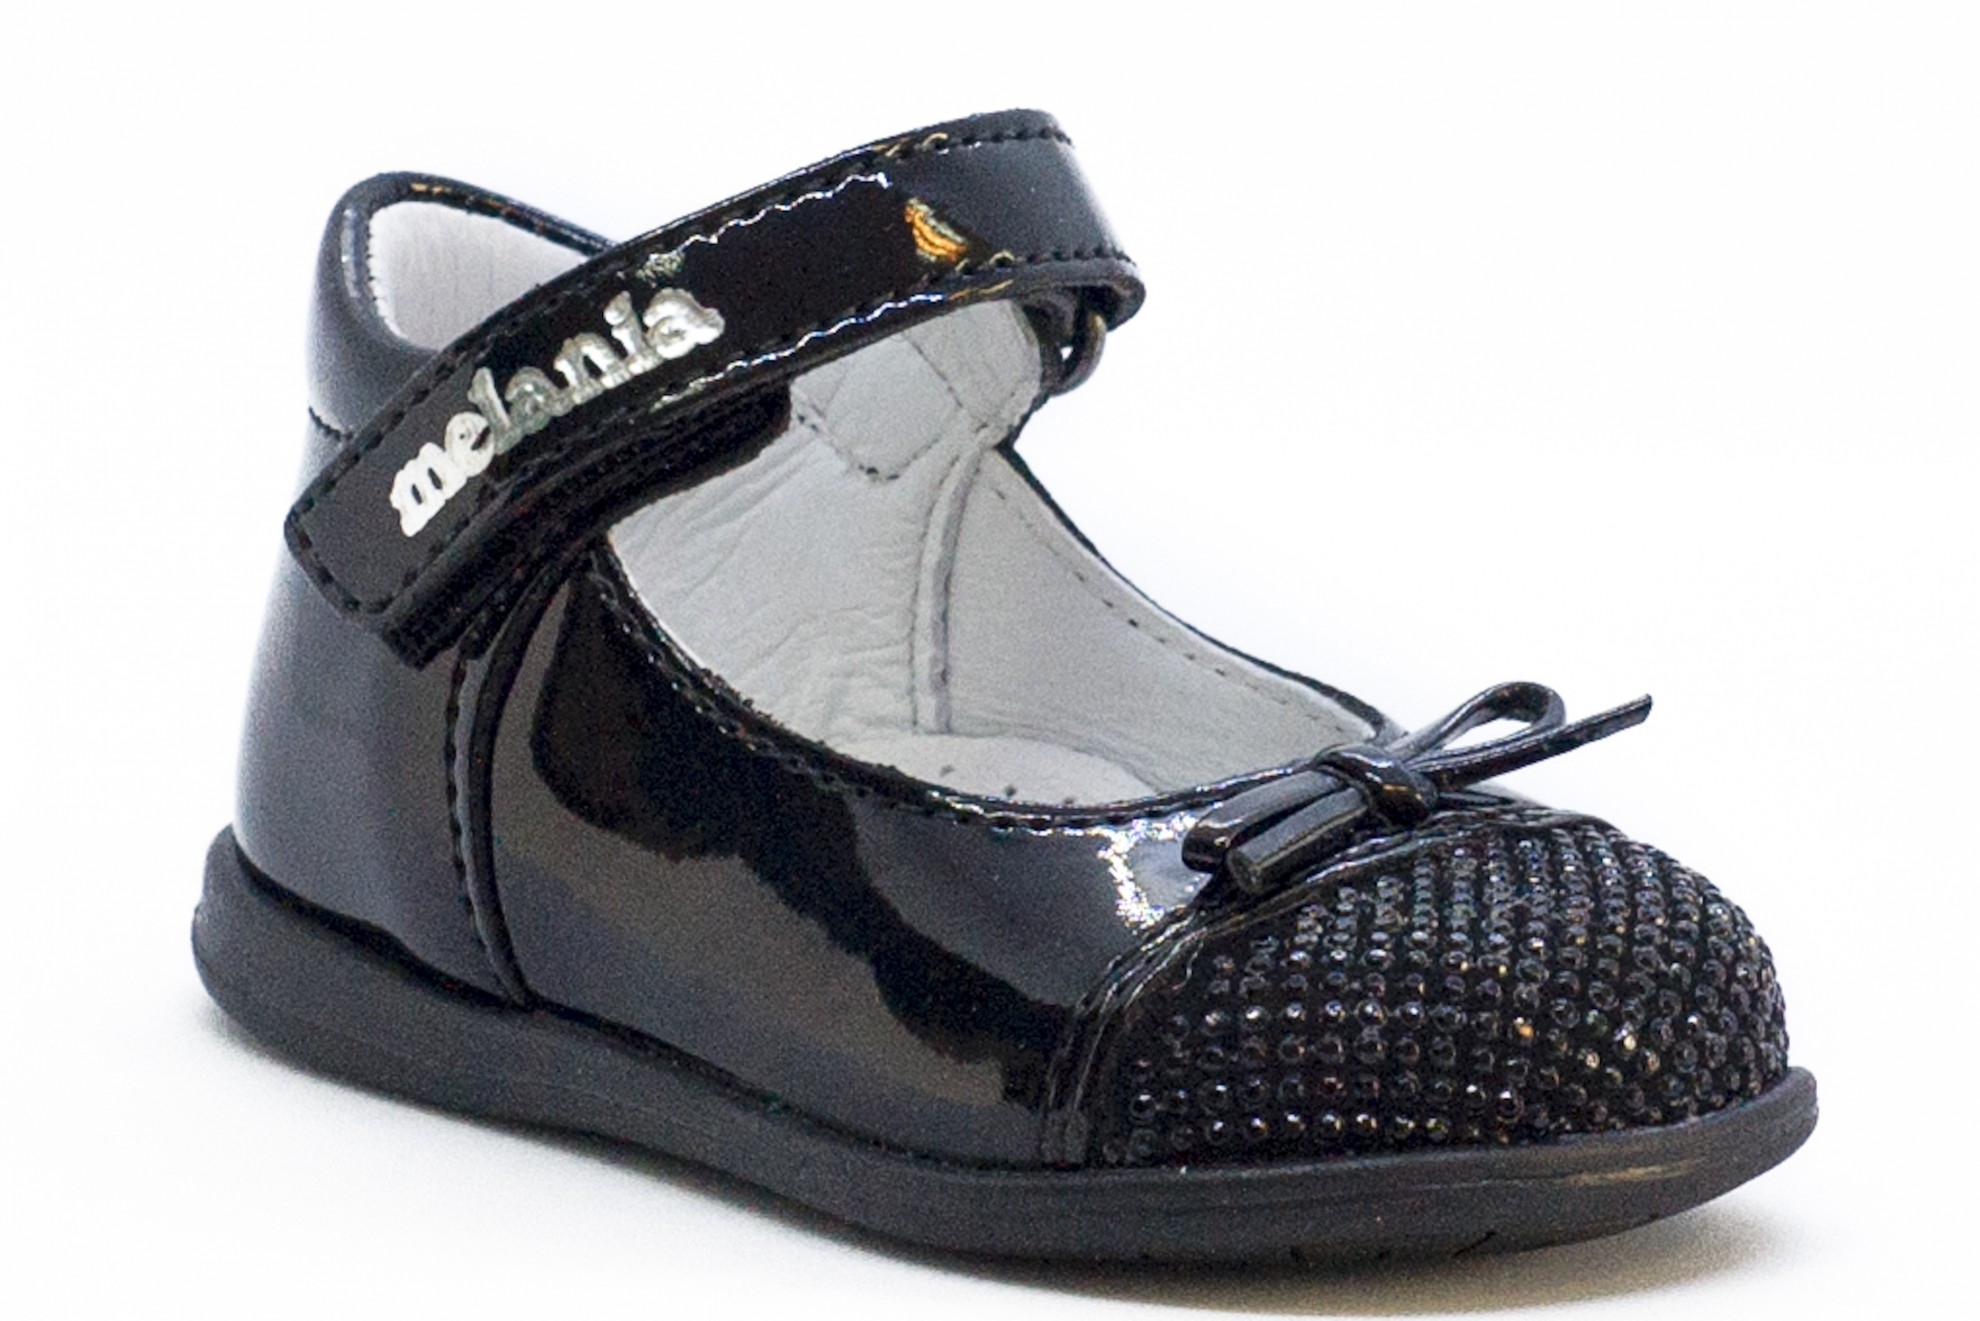 Pantofi negri cu strasuri negre varf